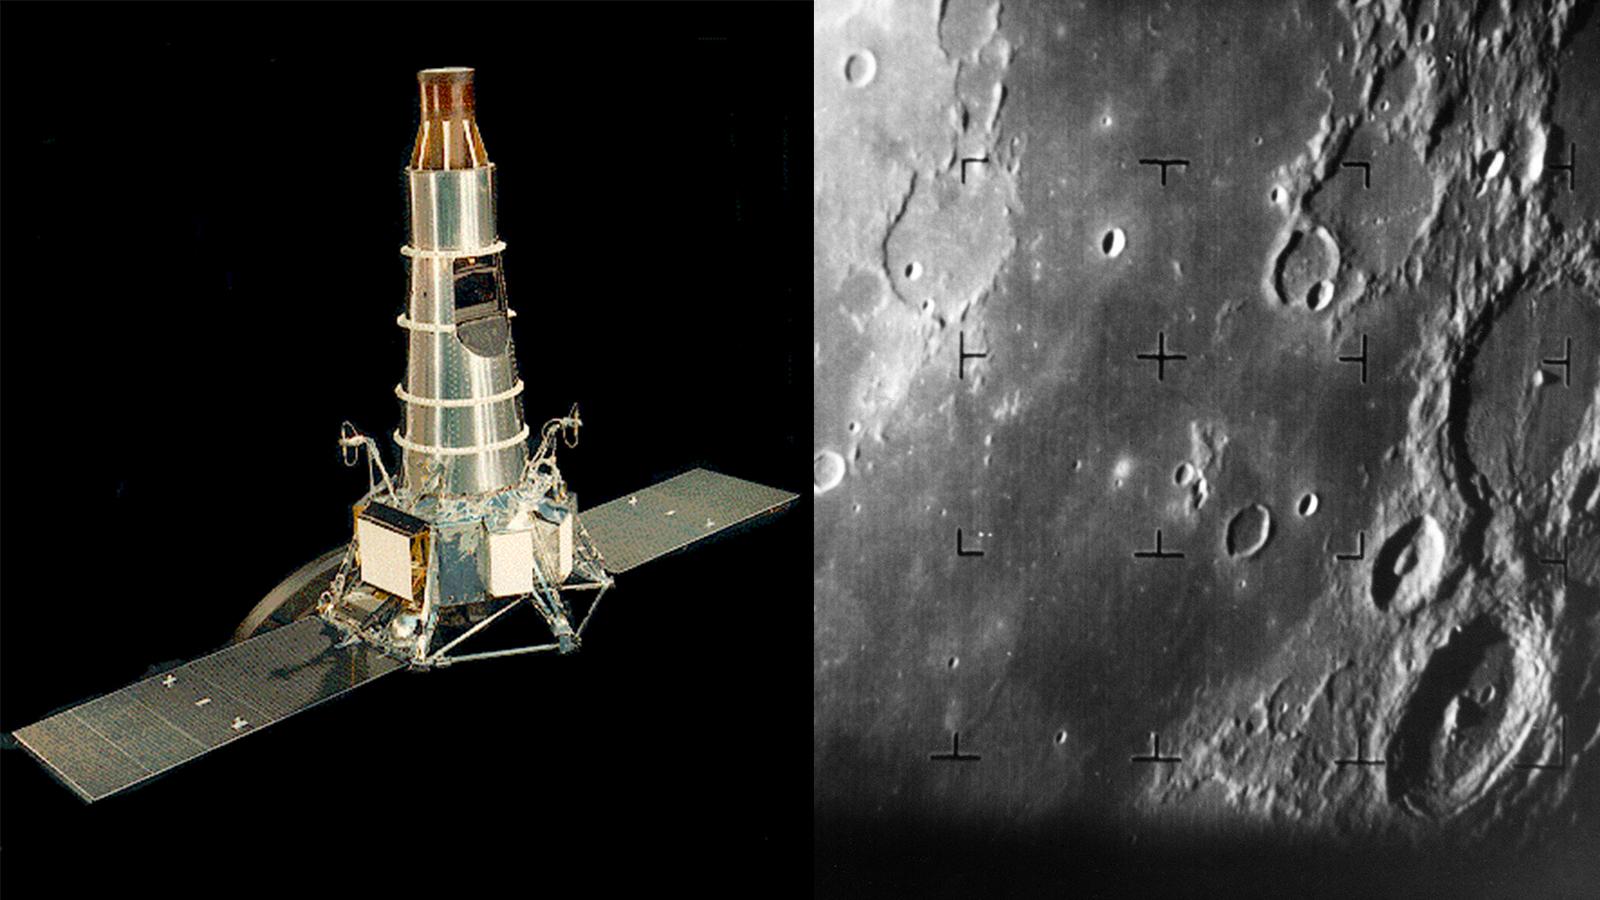 Building Blocks of Artemis 1